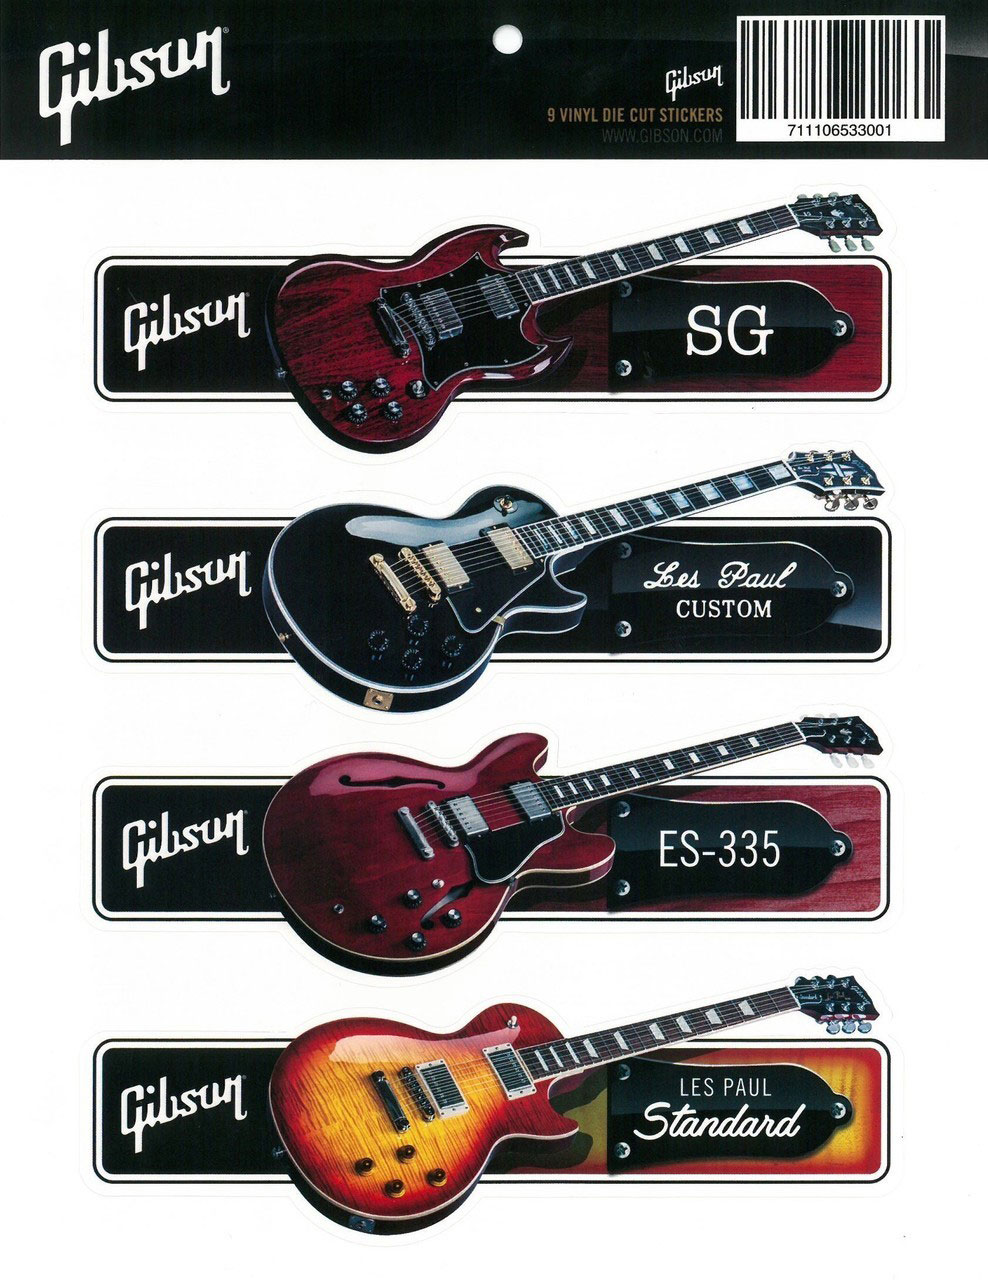 Gibson Gibson Sticker Pack